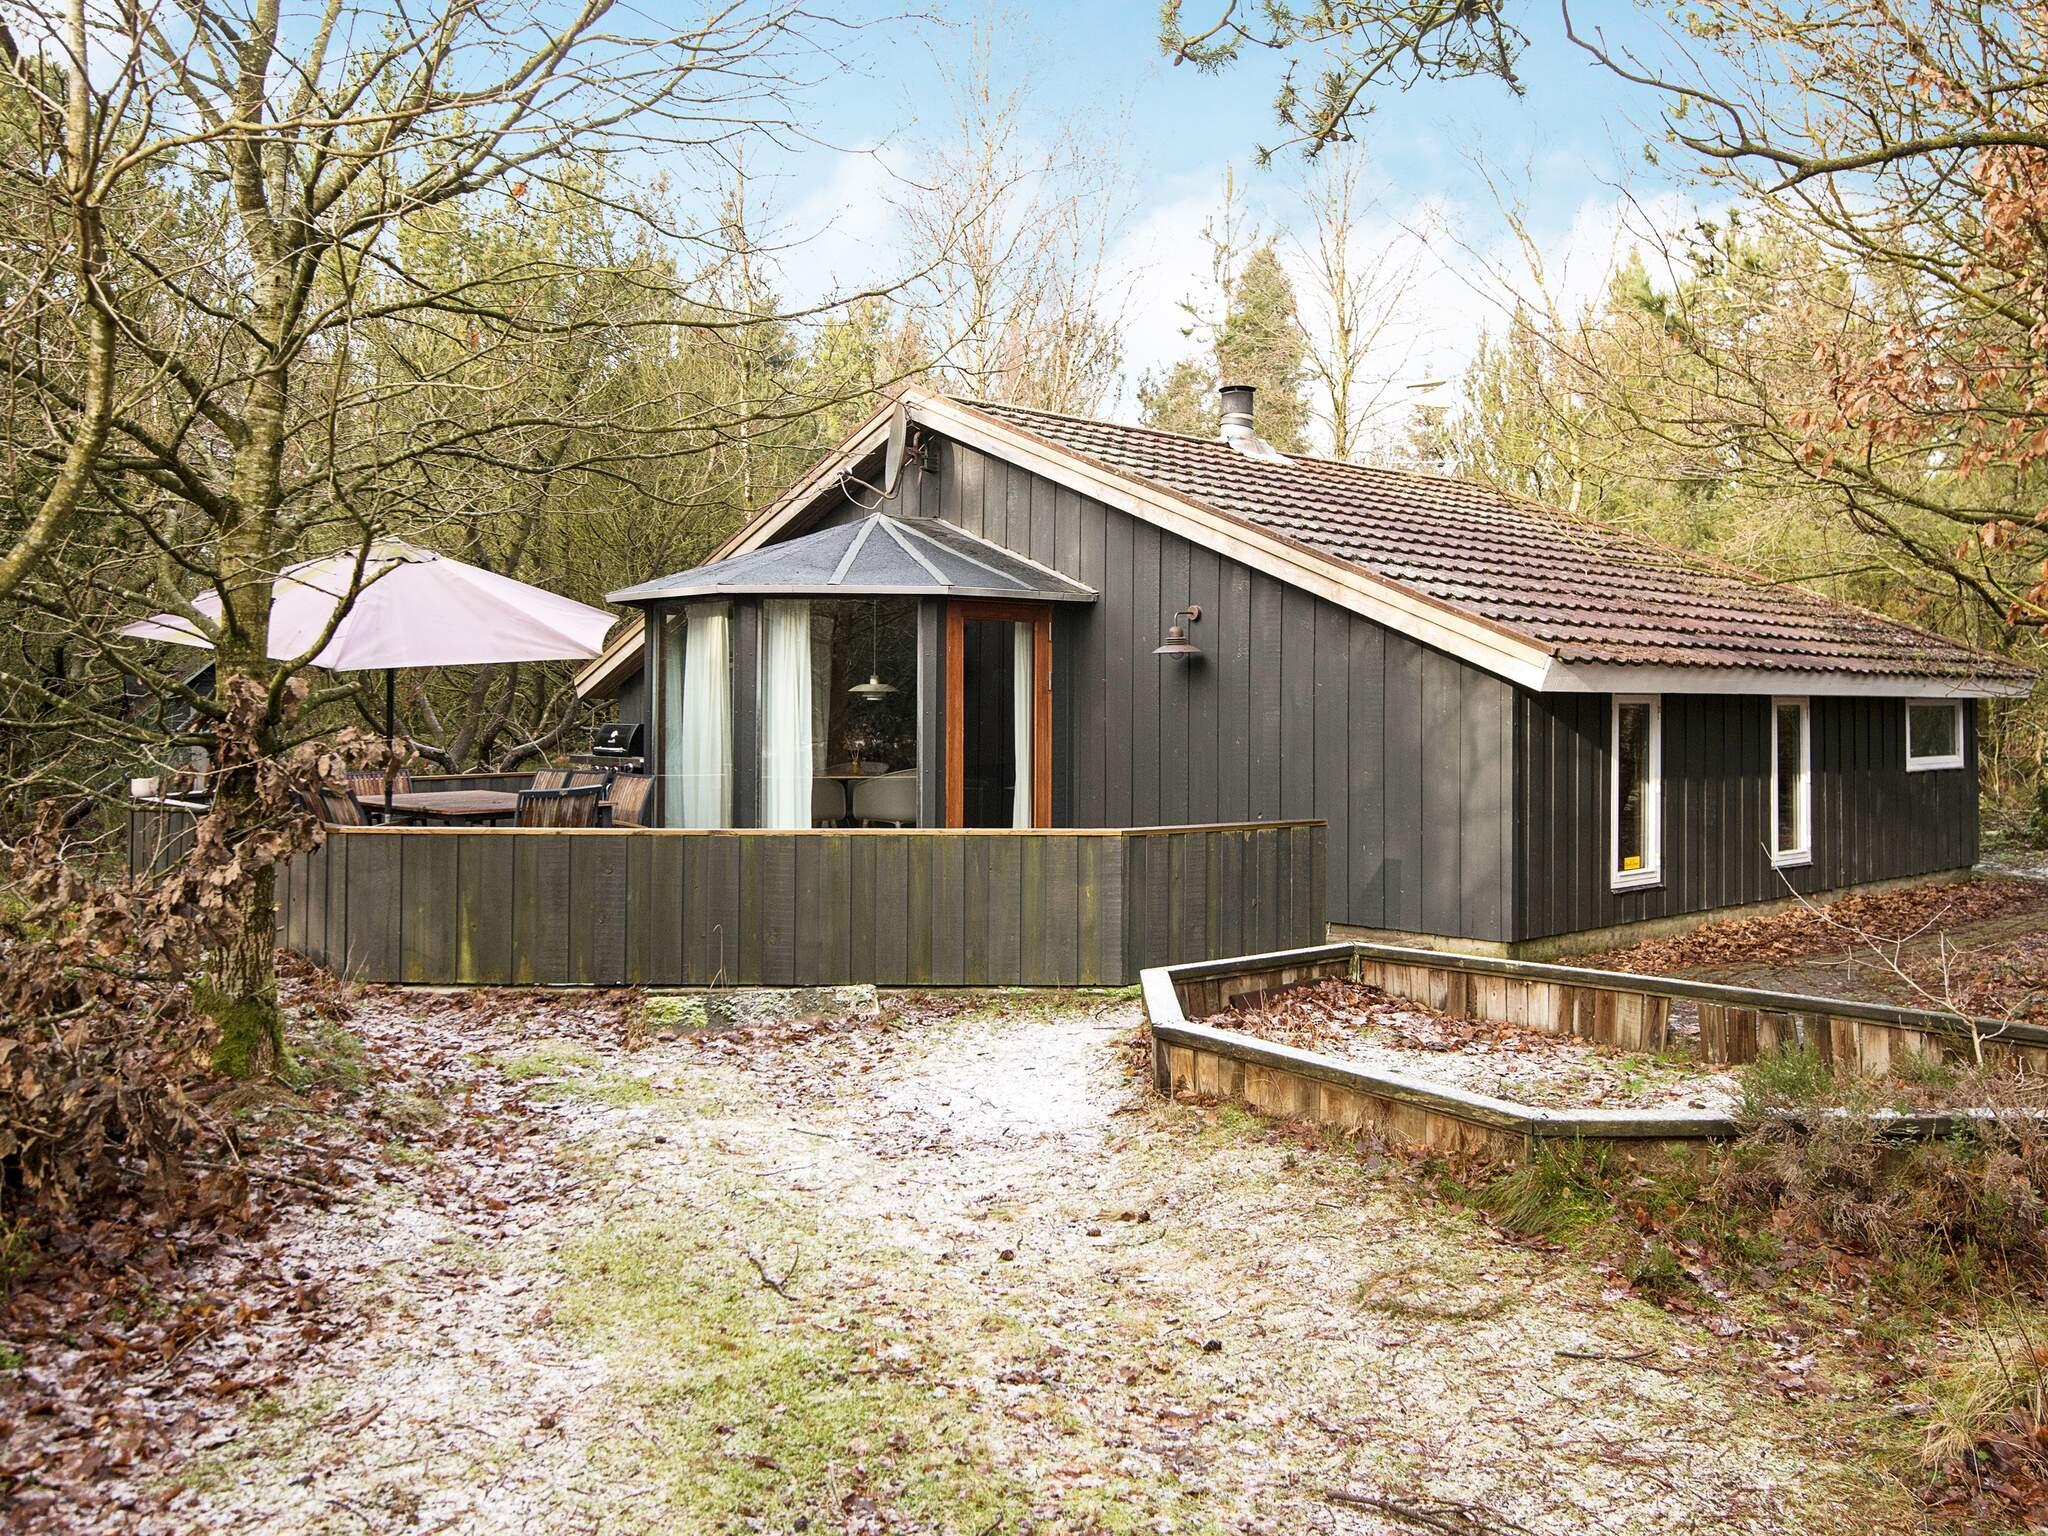 Ferienhaus Kølkær (87697), Kølkær, , Westjütland, Dänemark, Bild 21